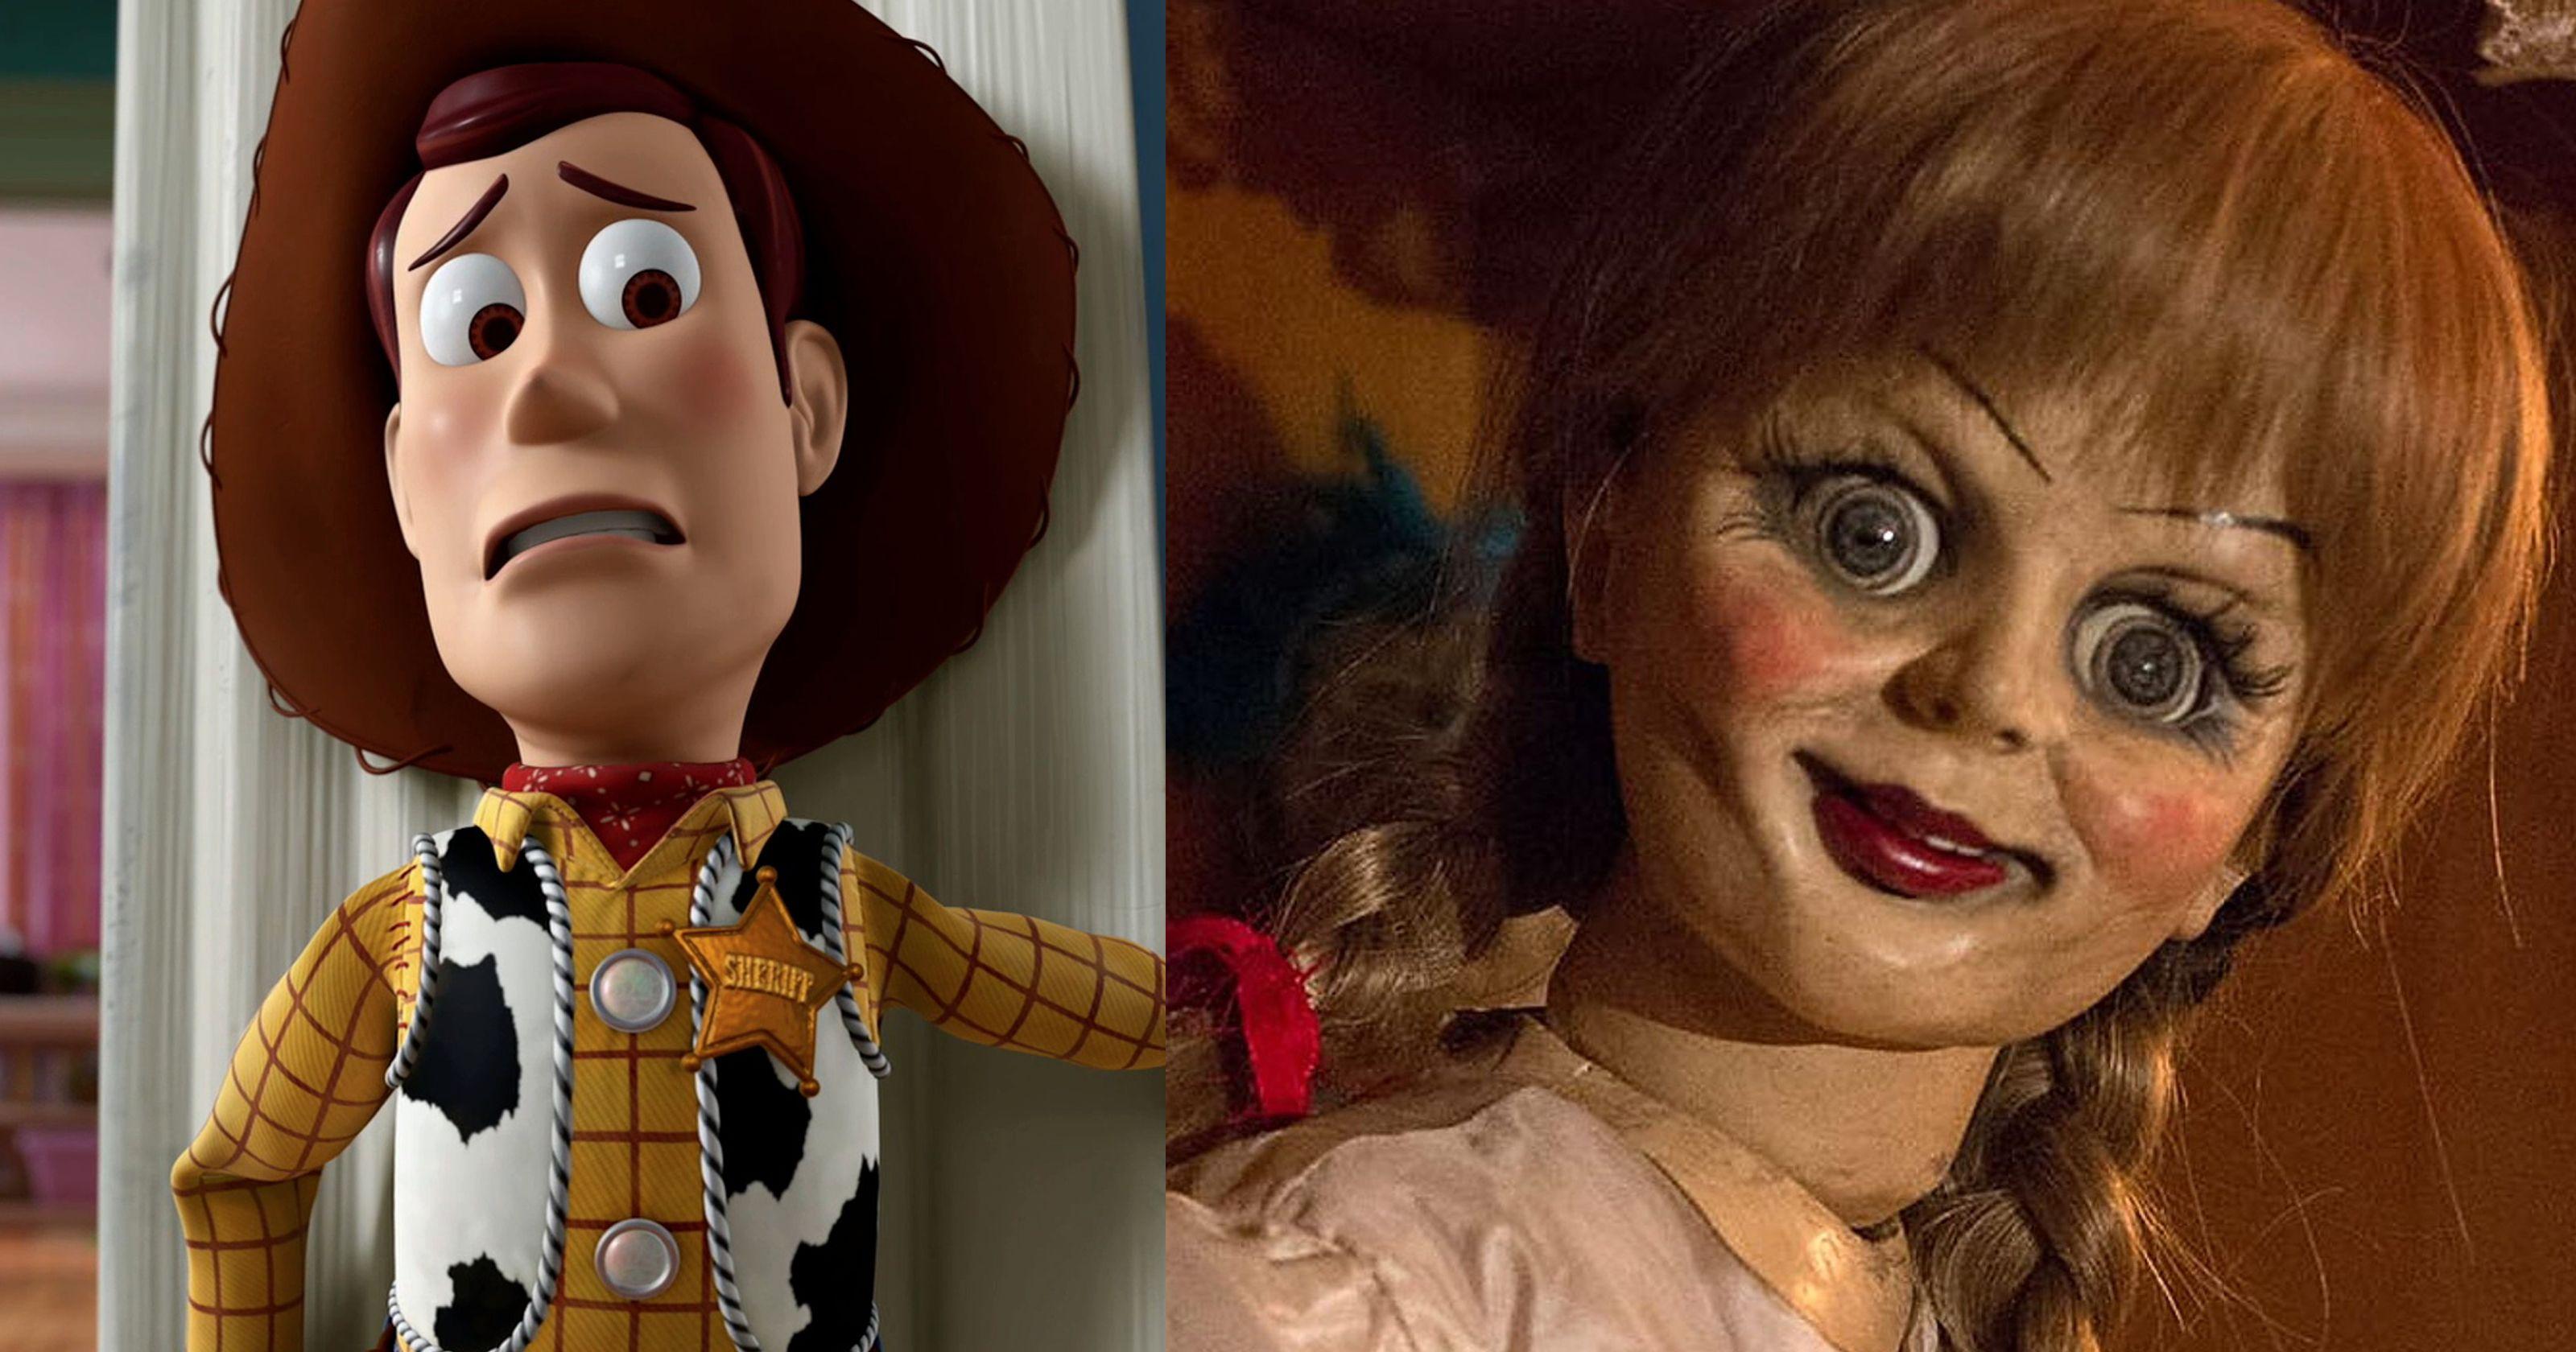 'Toy Story 4': ¿Conseguirá 'Annabelle 3' vencerles en taquilla?